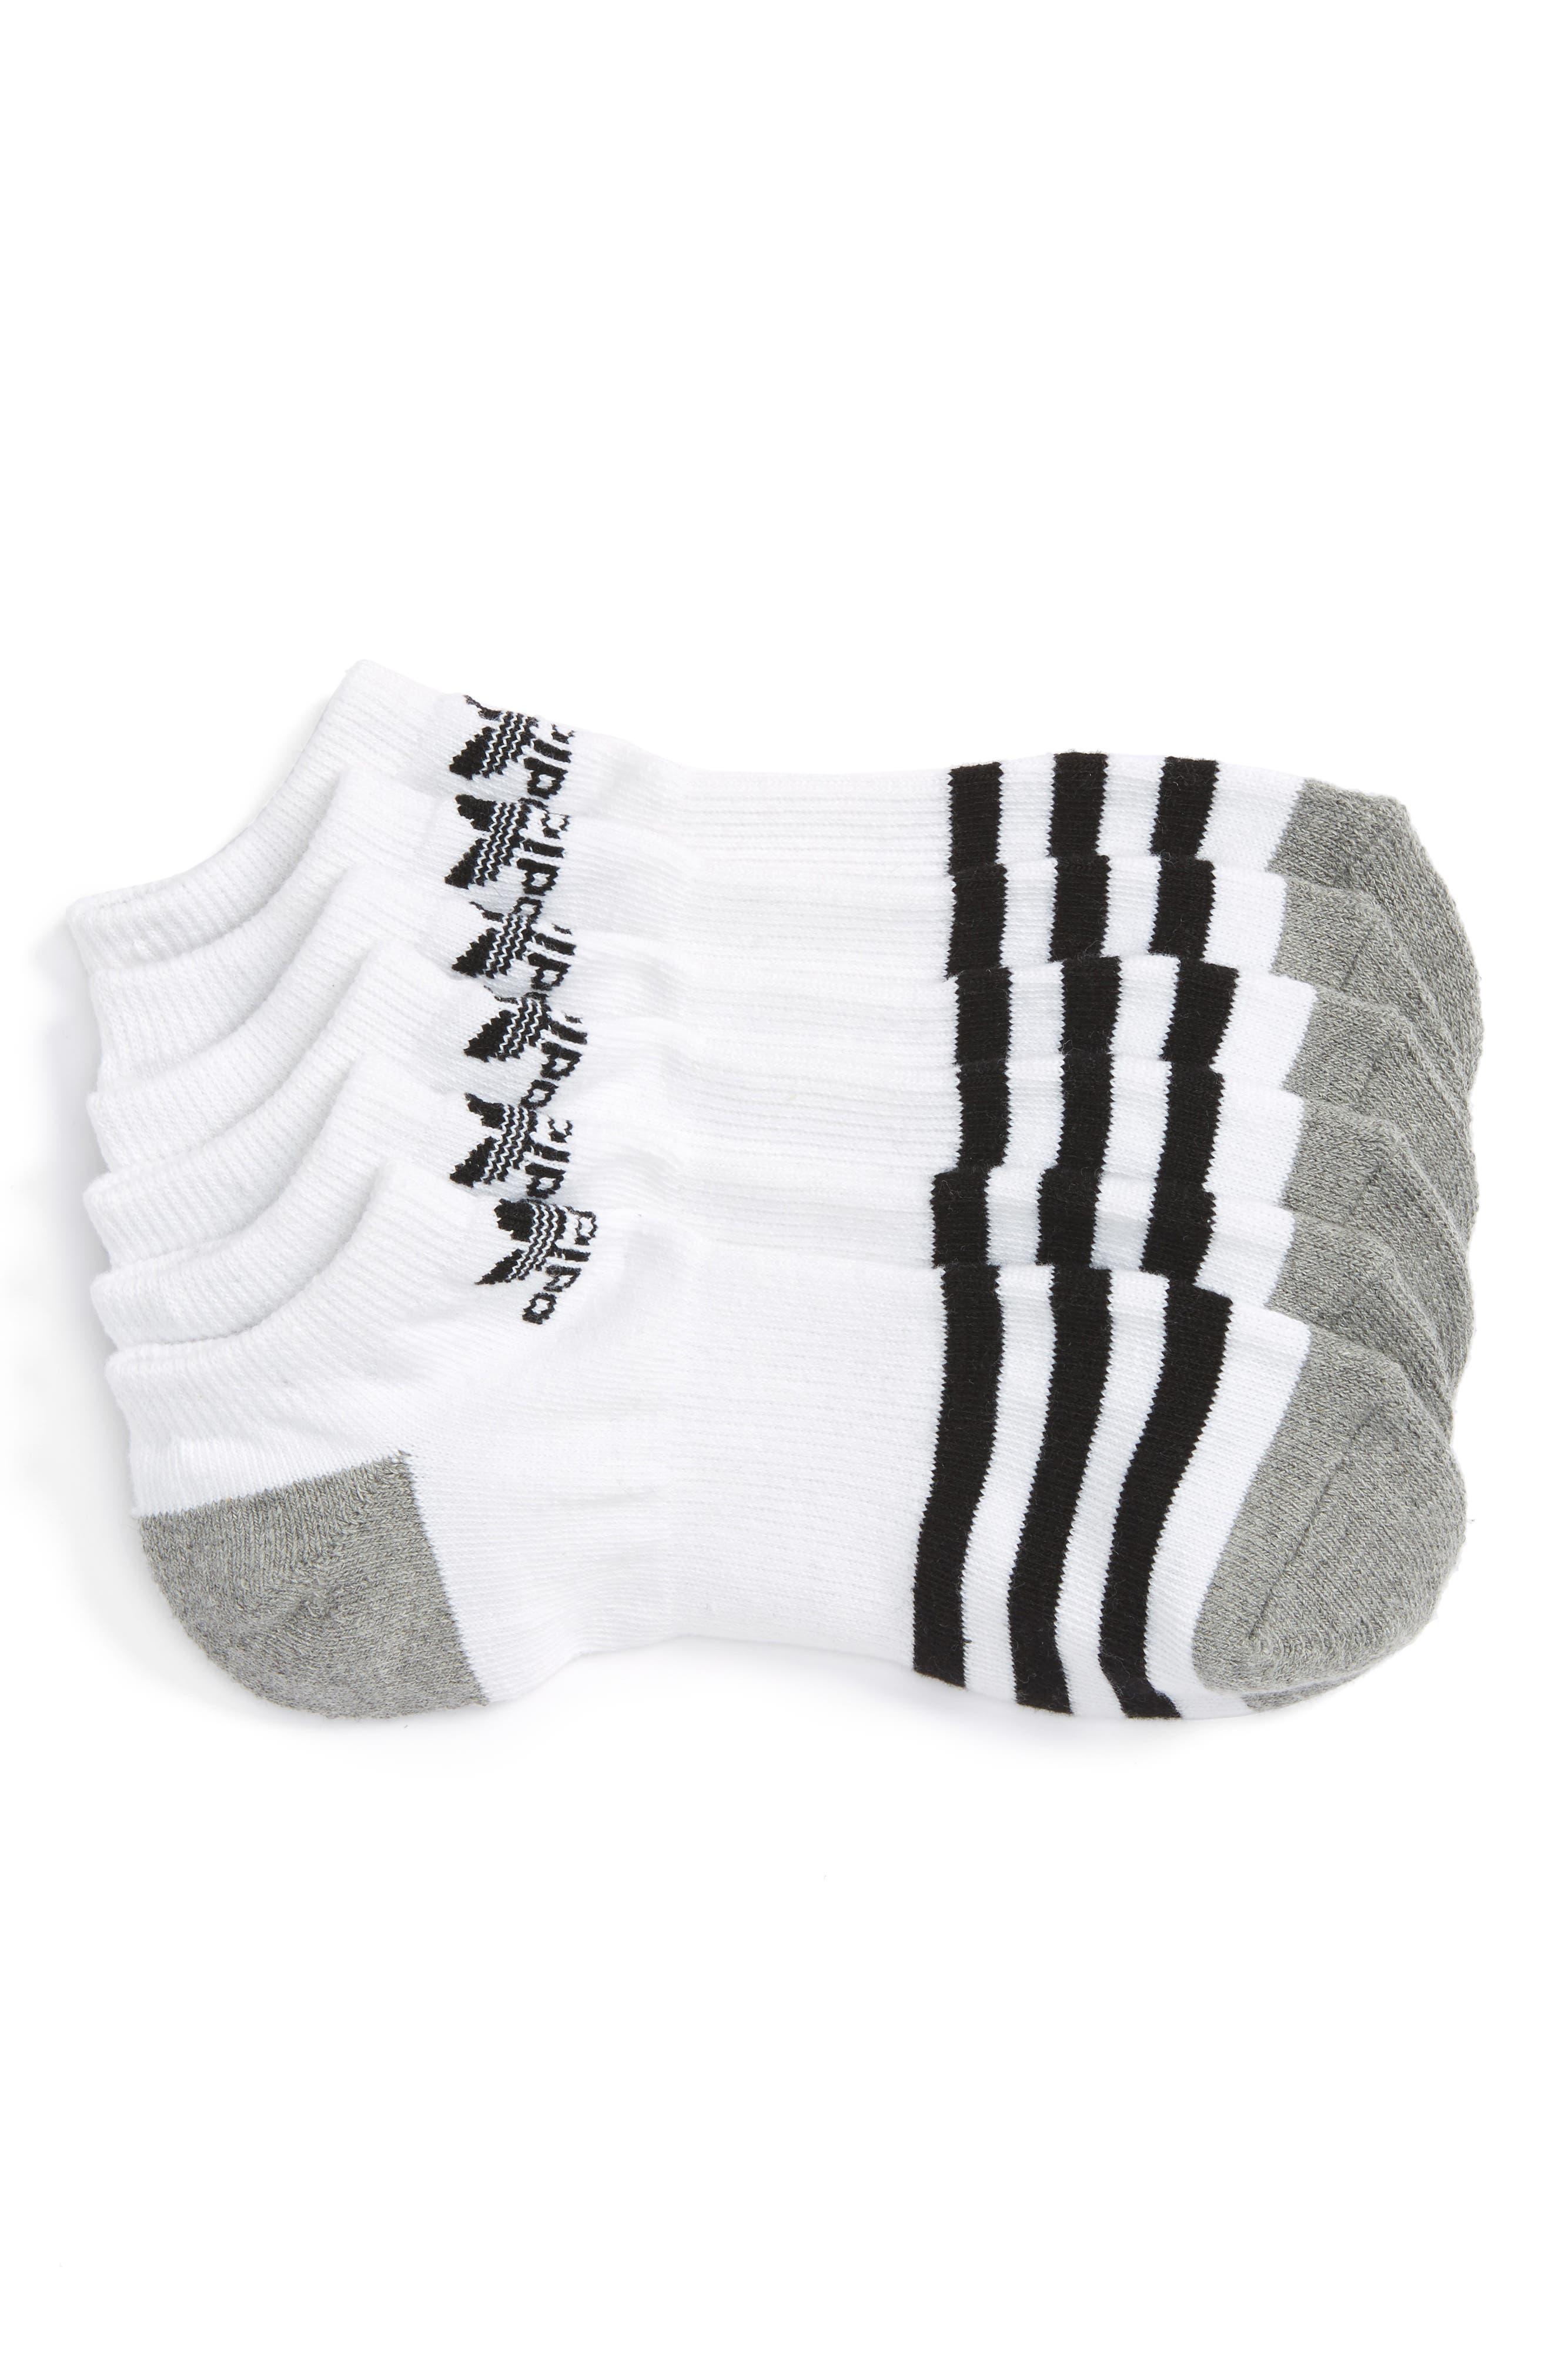 3-Pack Original Cushioned No-Show Socks,                             Main thumbnail 1, color,                             White/ Black/ White